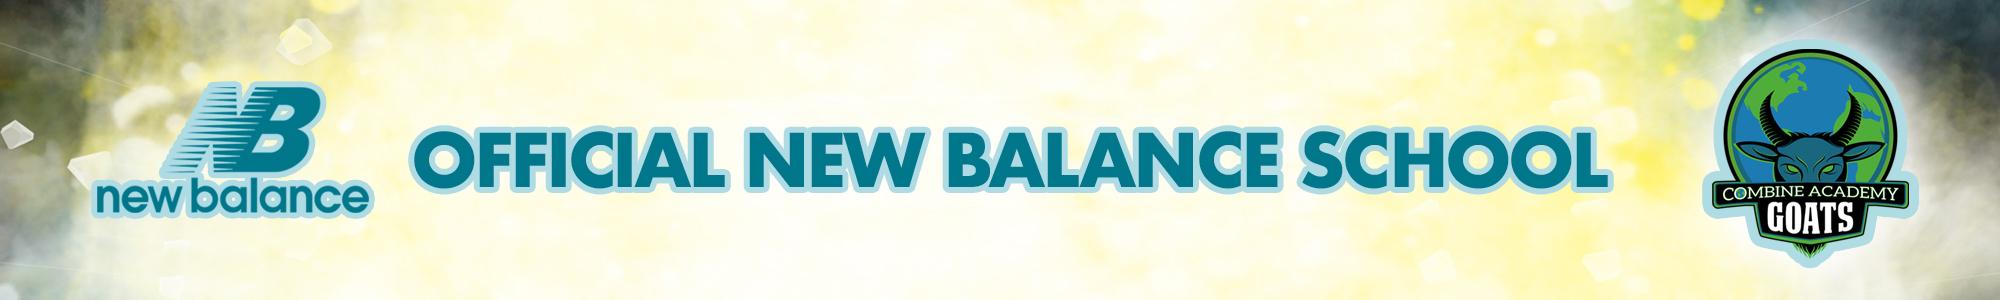 Official New Balance School